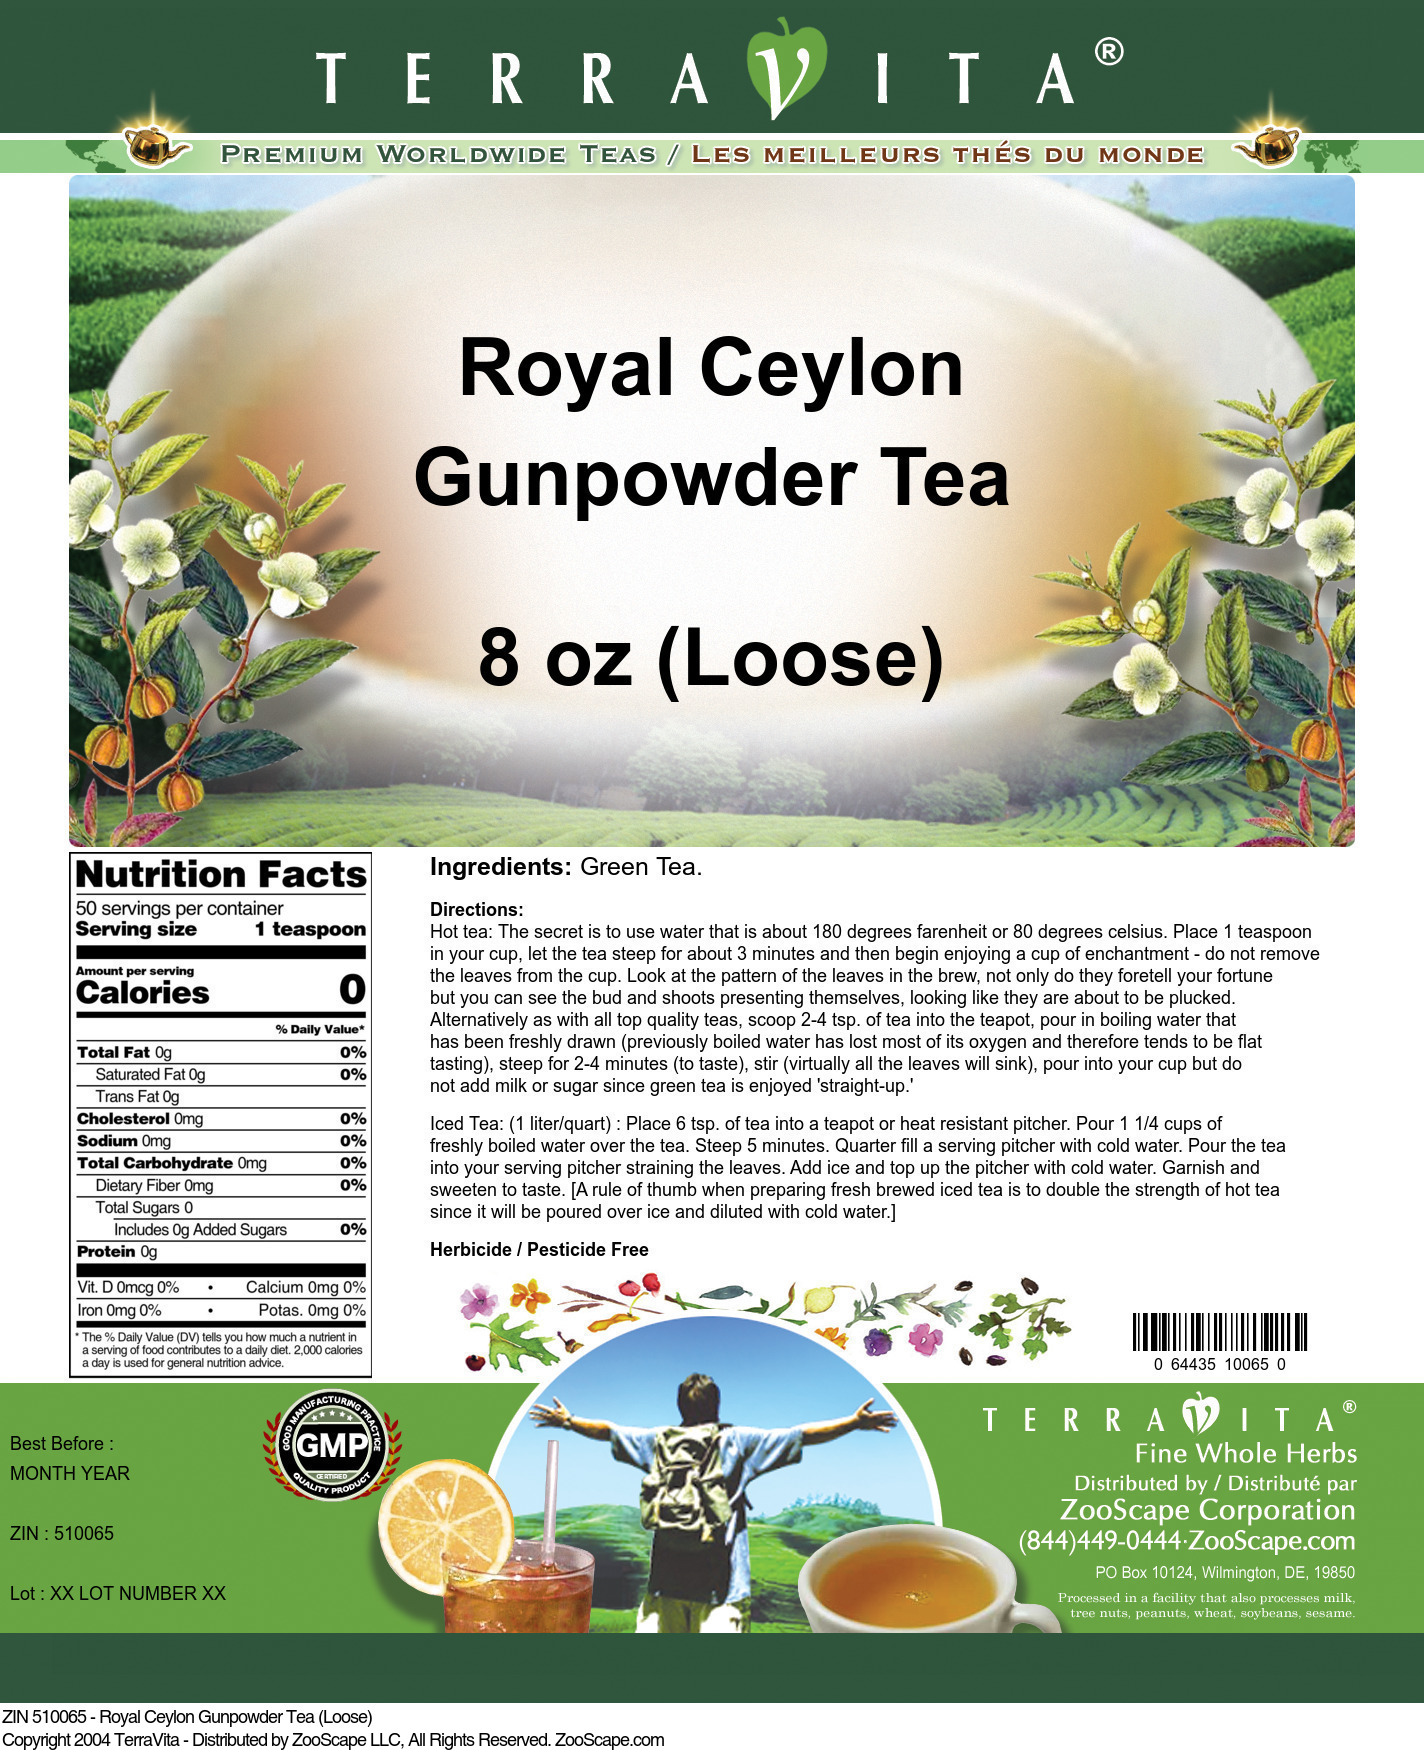 Royal Ceylon Gunpowder Tea (Loose)